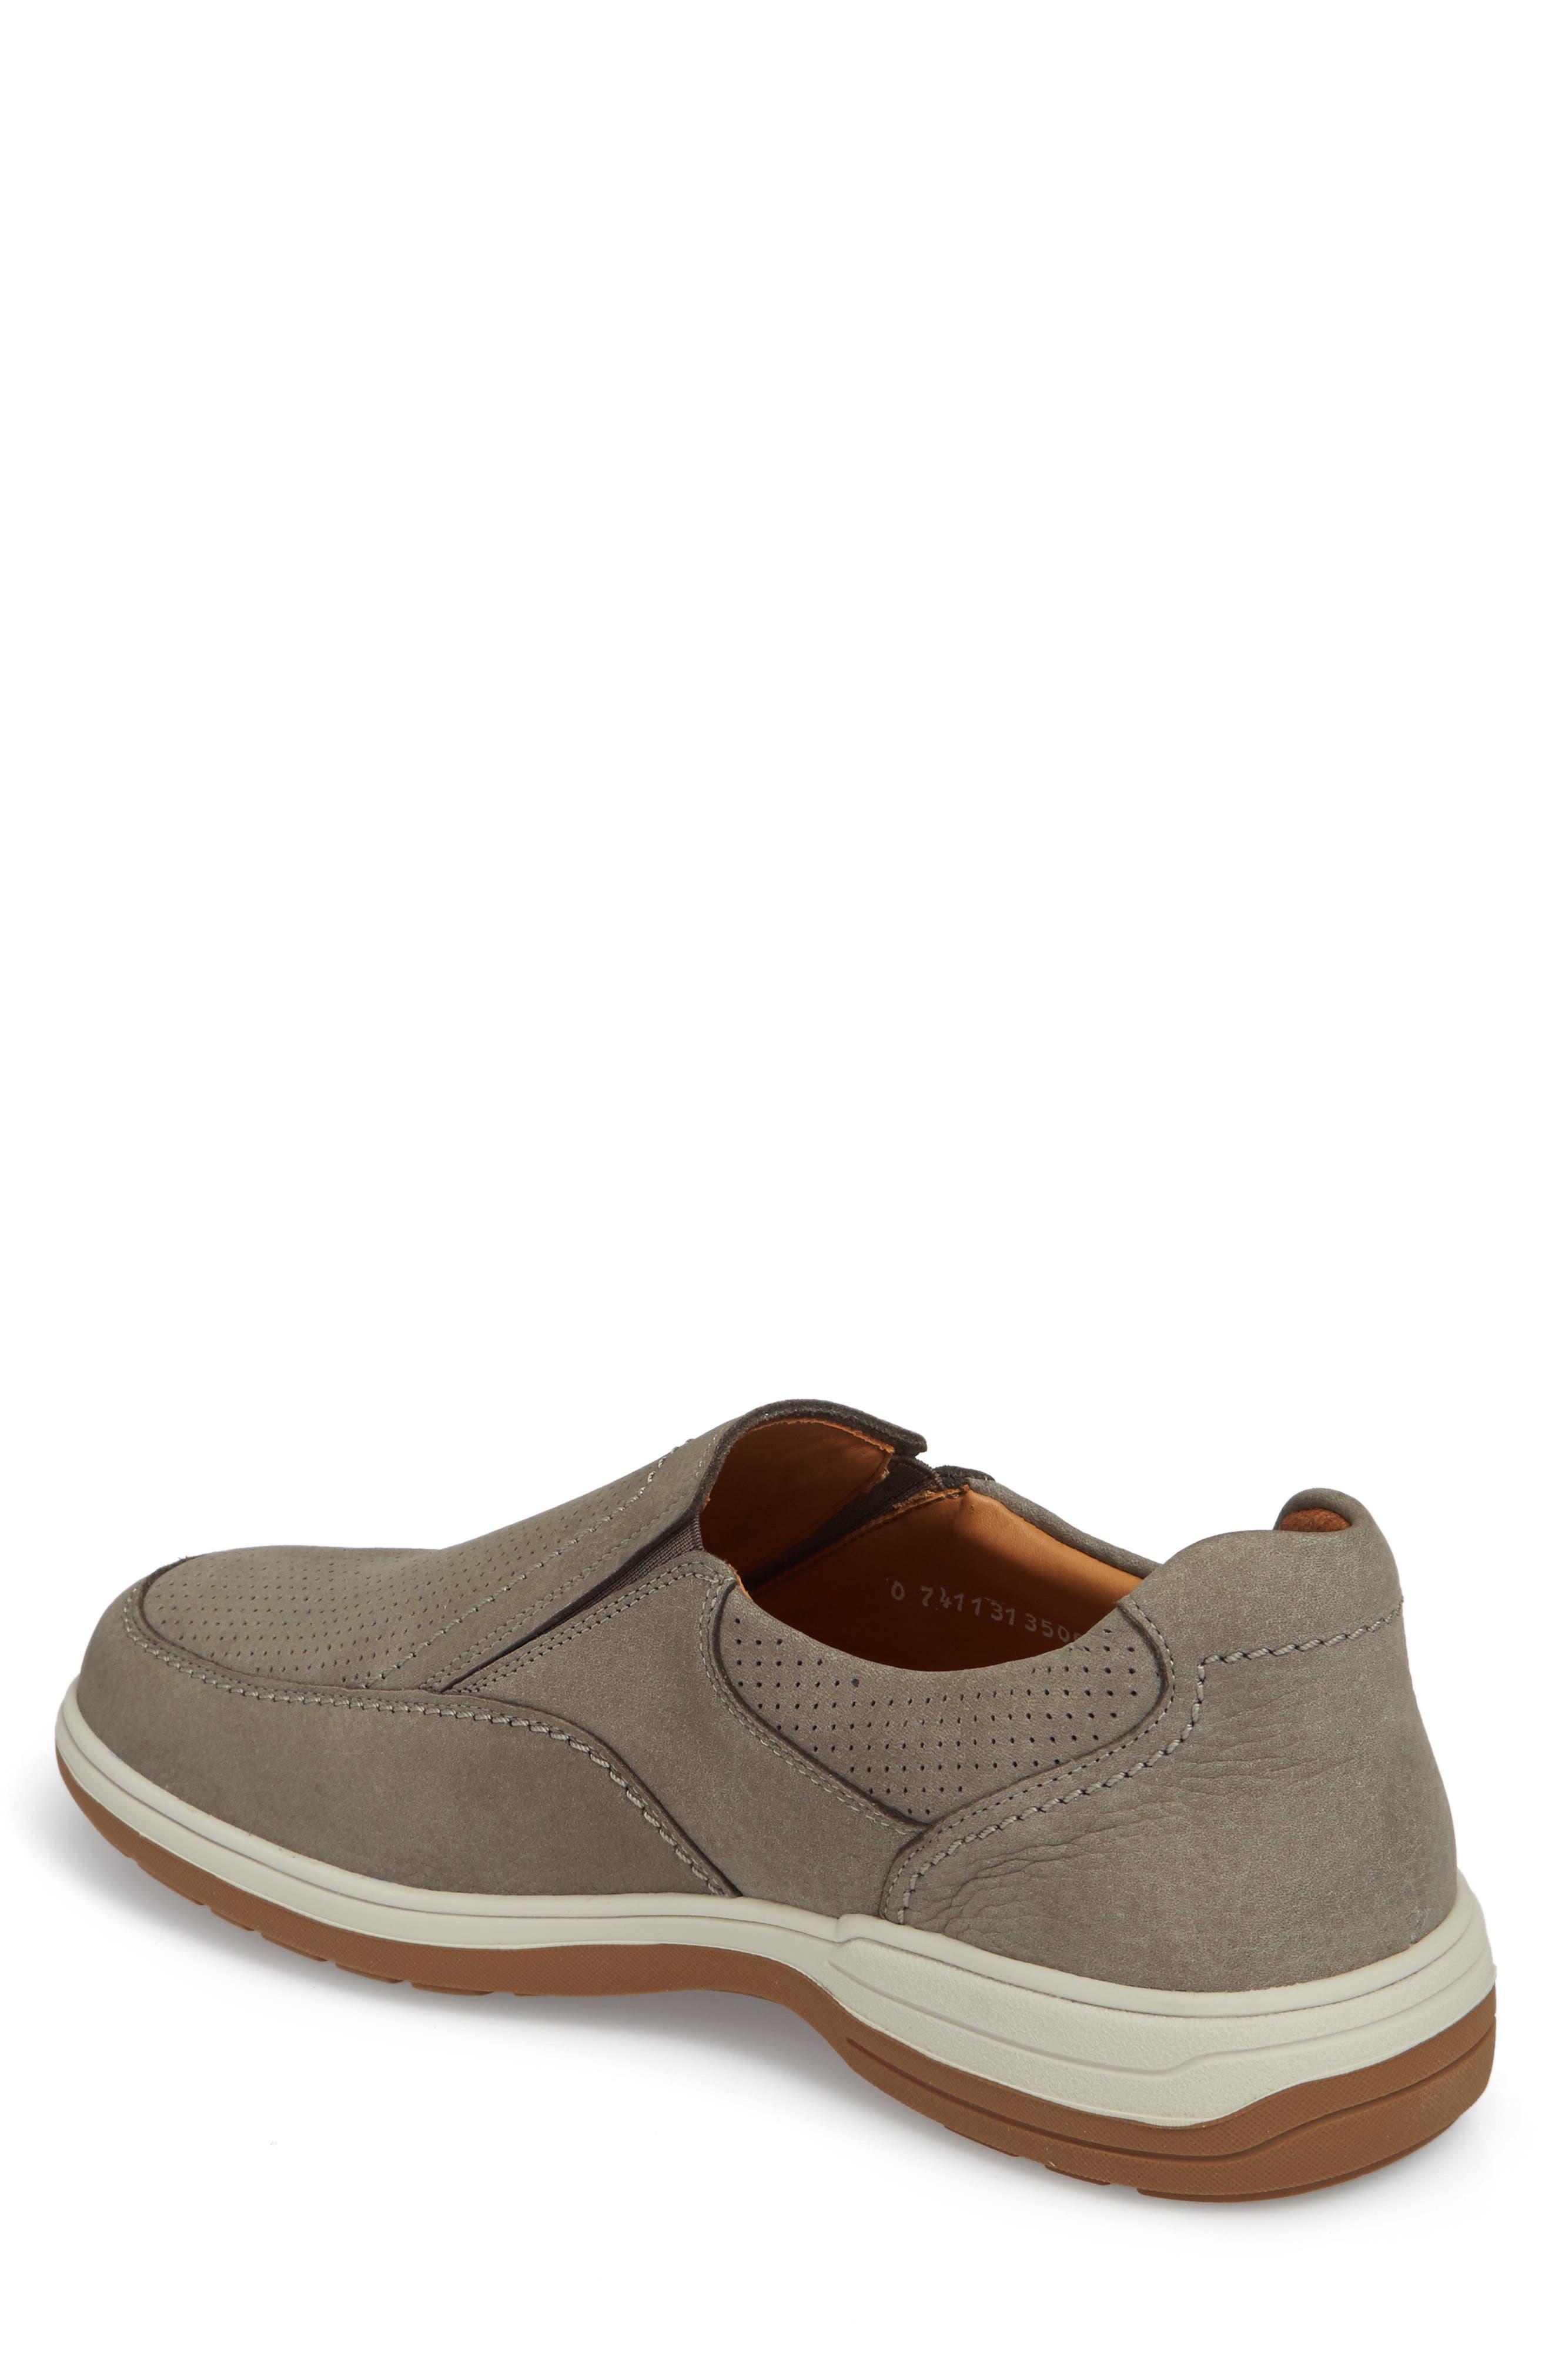 Davy Perforated Slip-On Sneaker,                             Alternate thumbnail 2, color,                             051